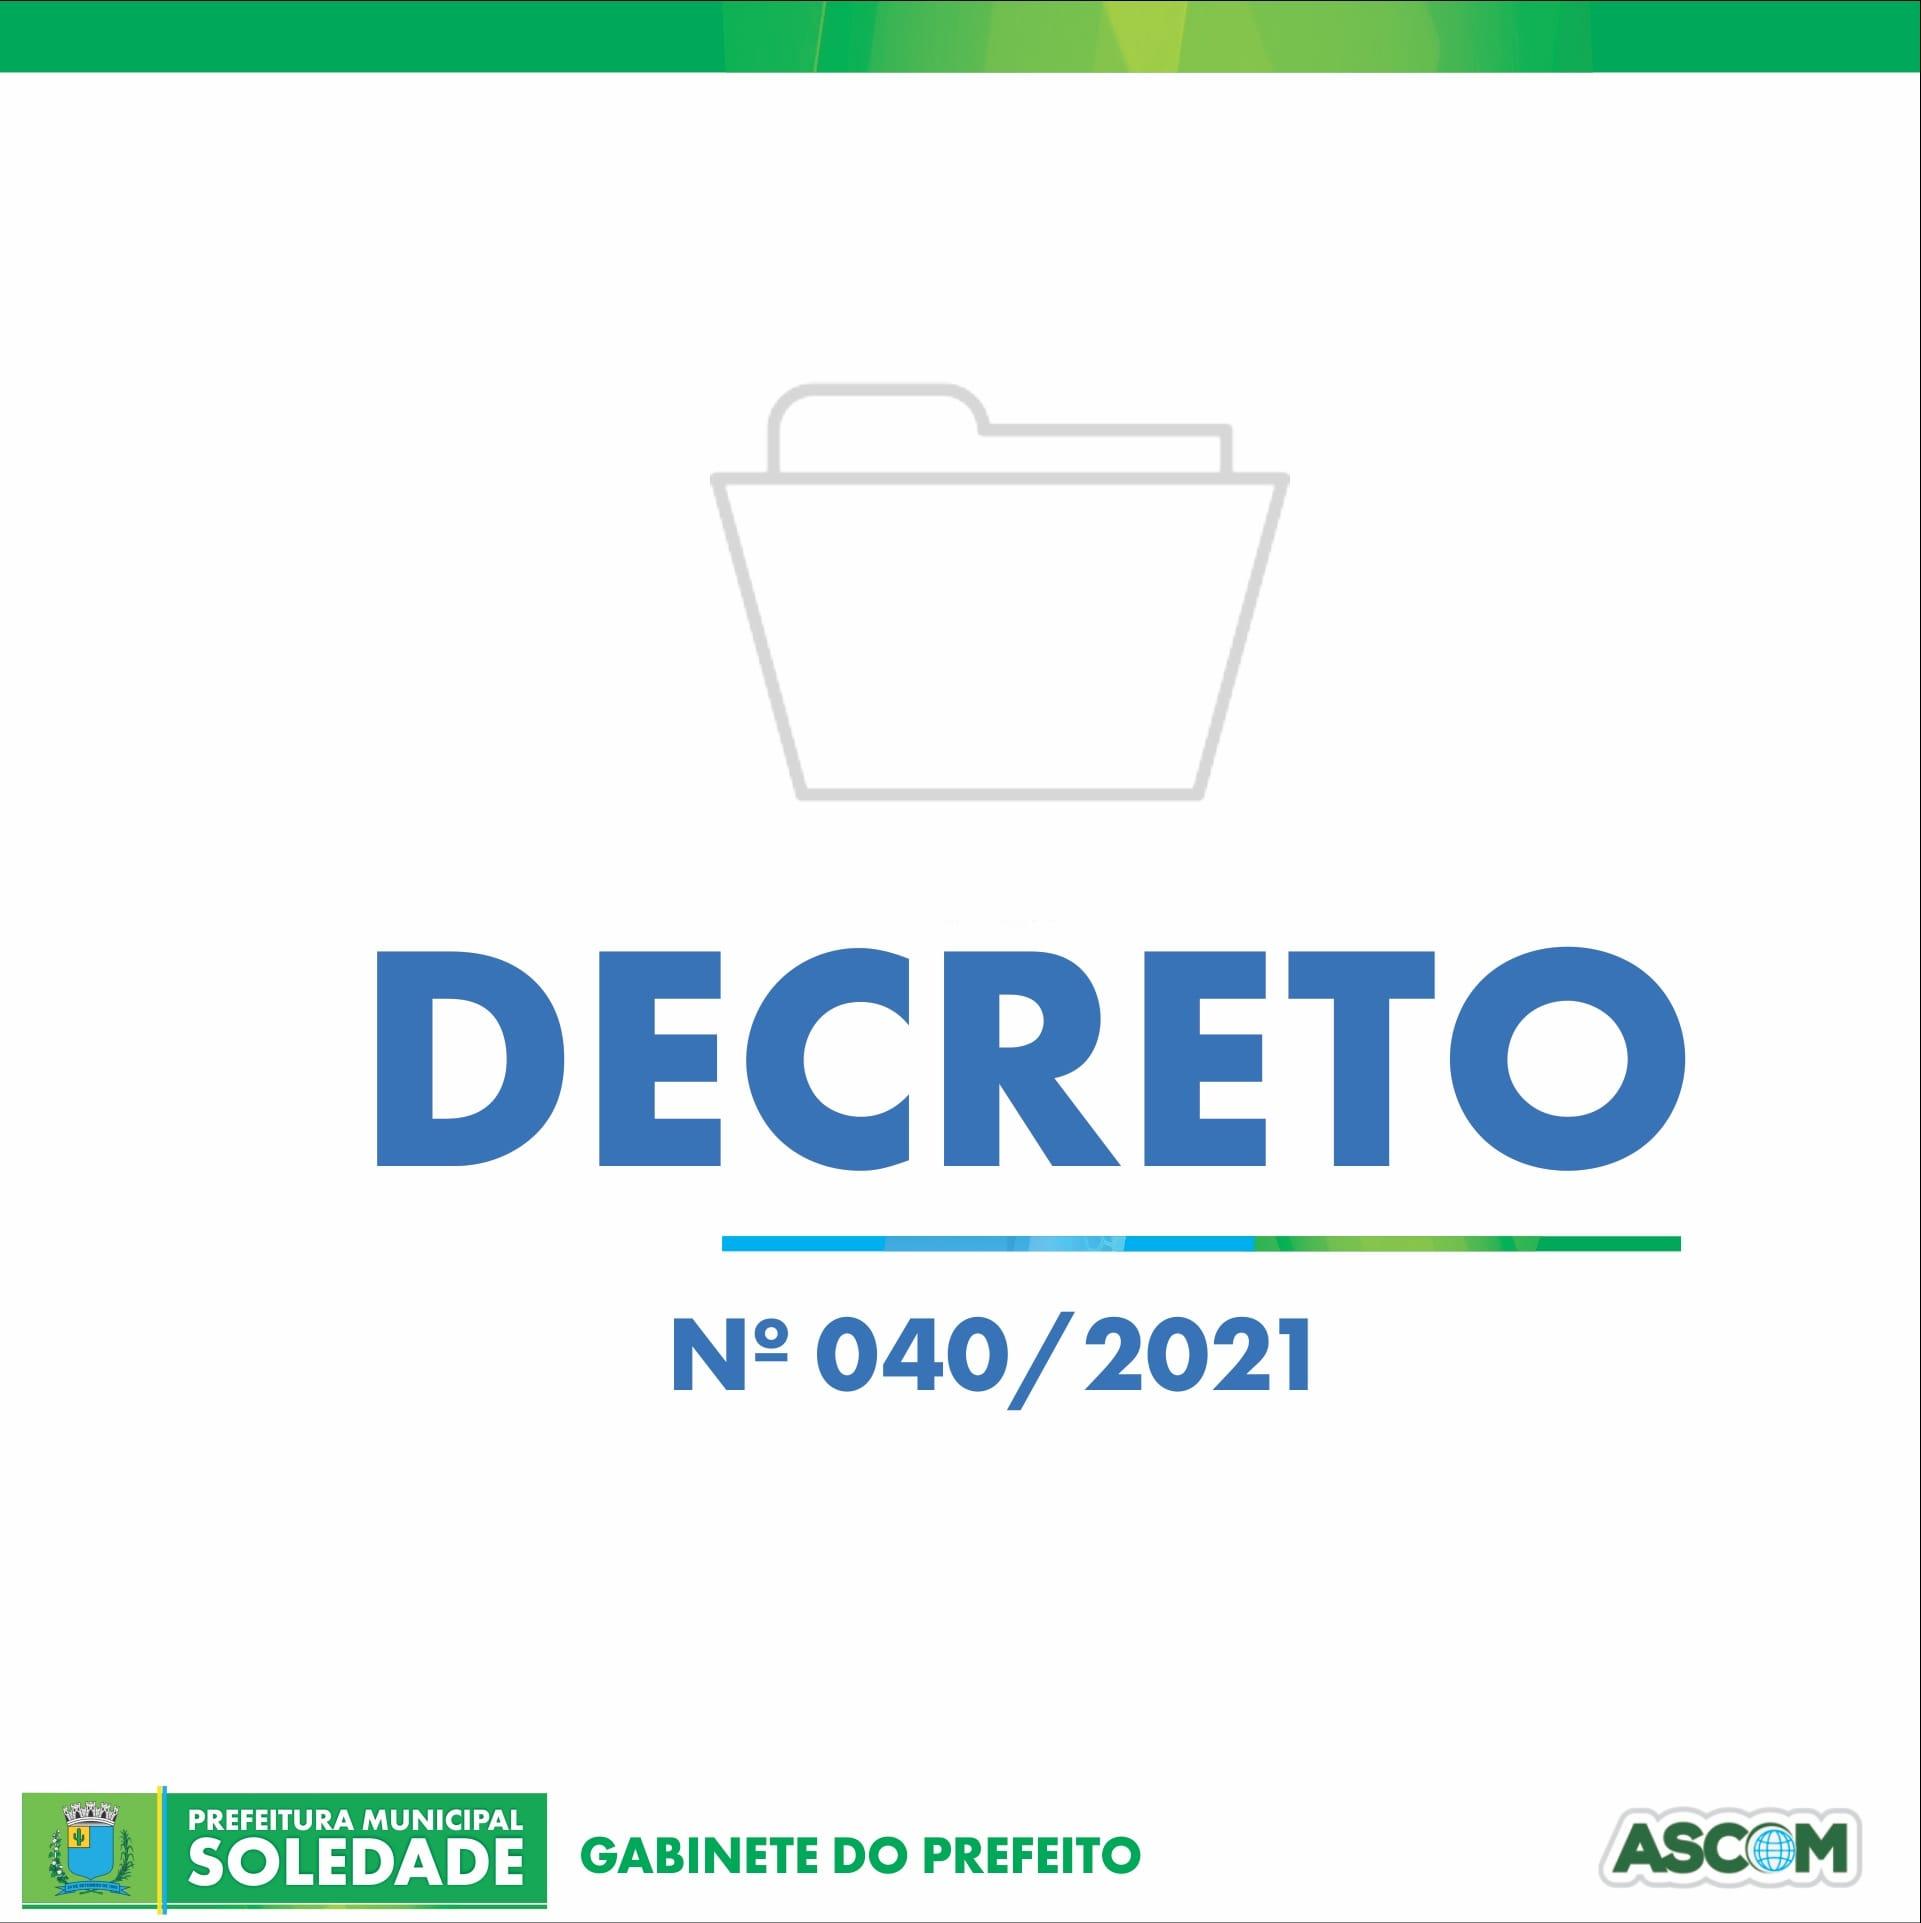 DECRETO Nº 040/2021